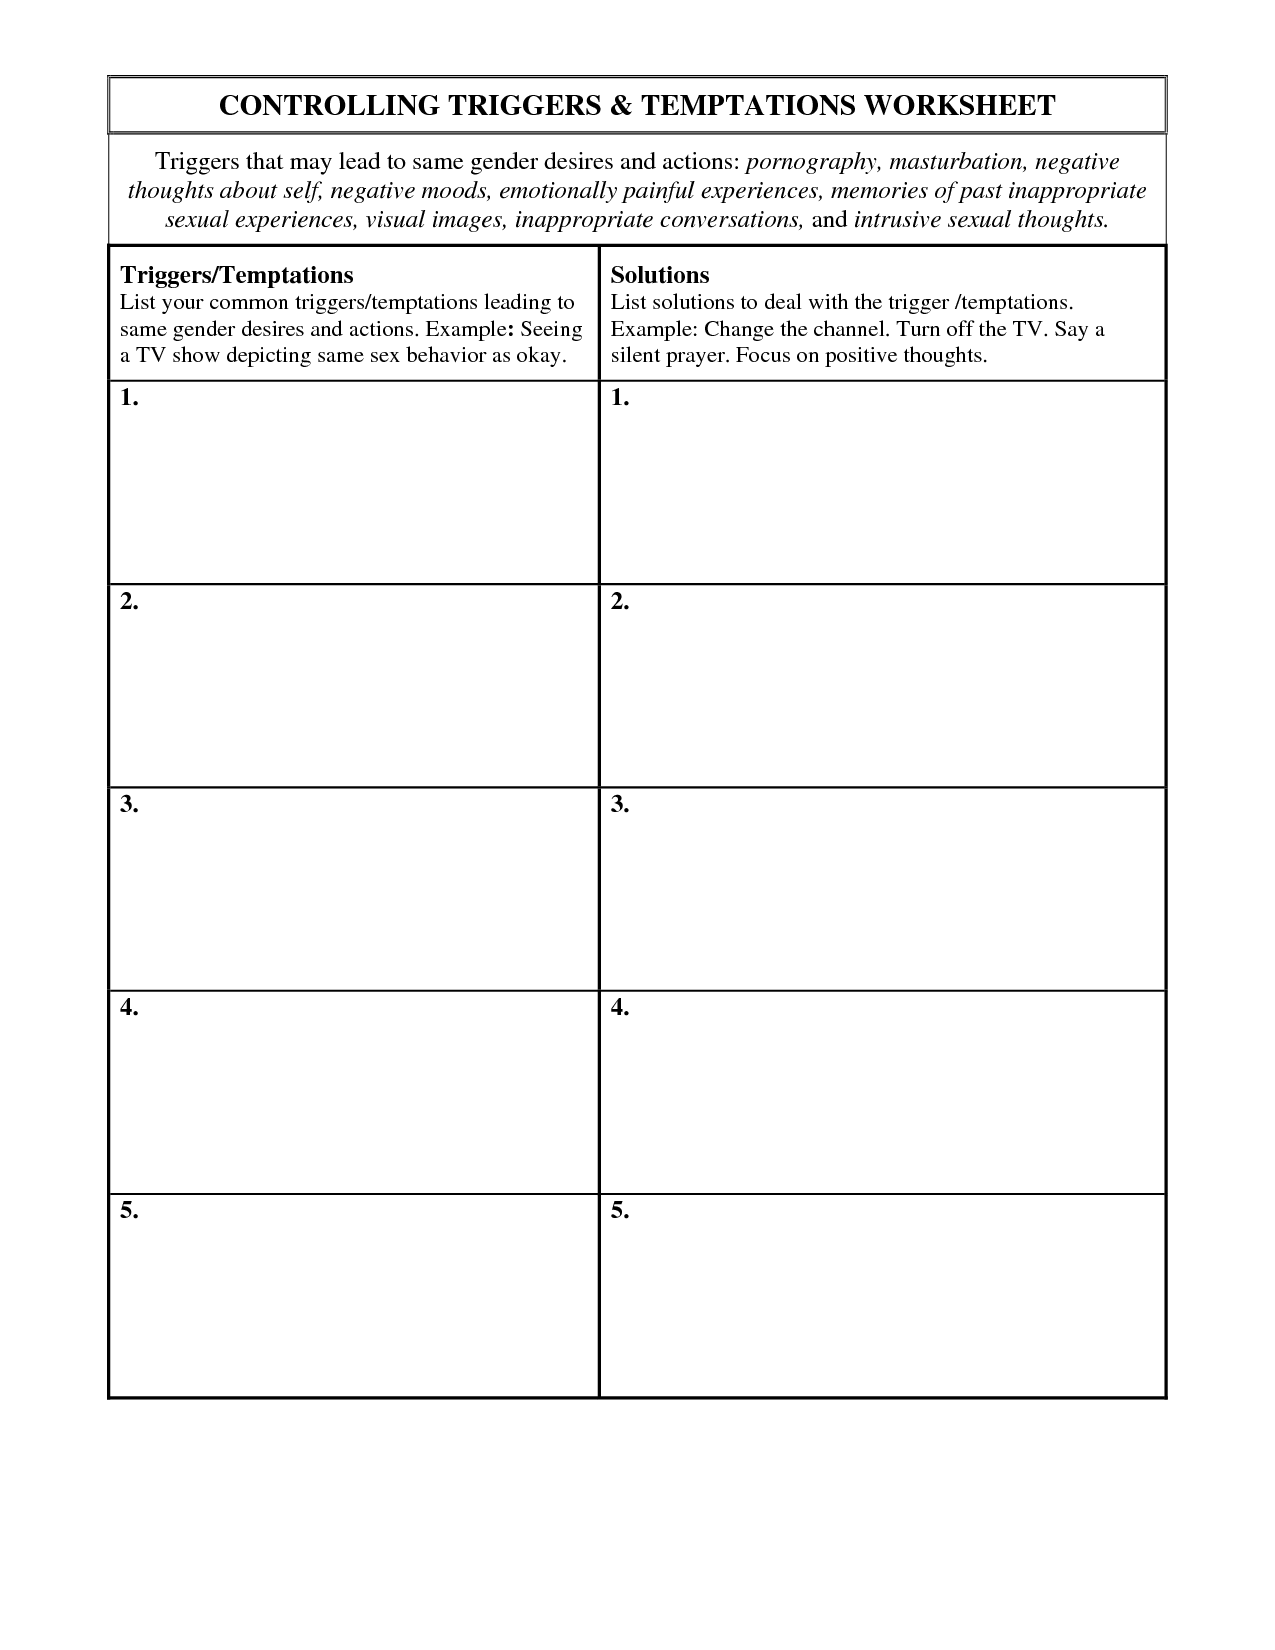 Hazelden 12 Step Worksheet Printable